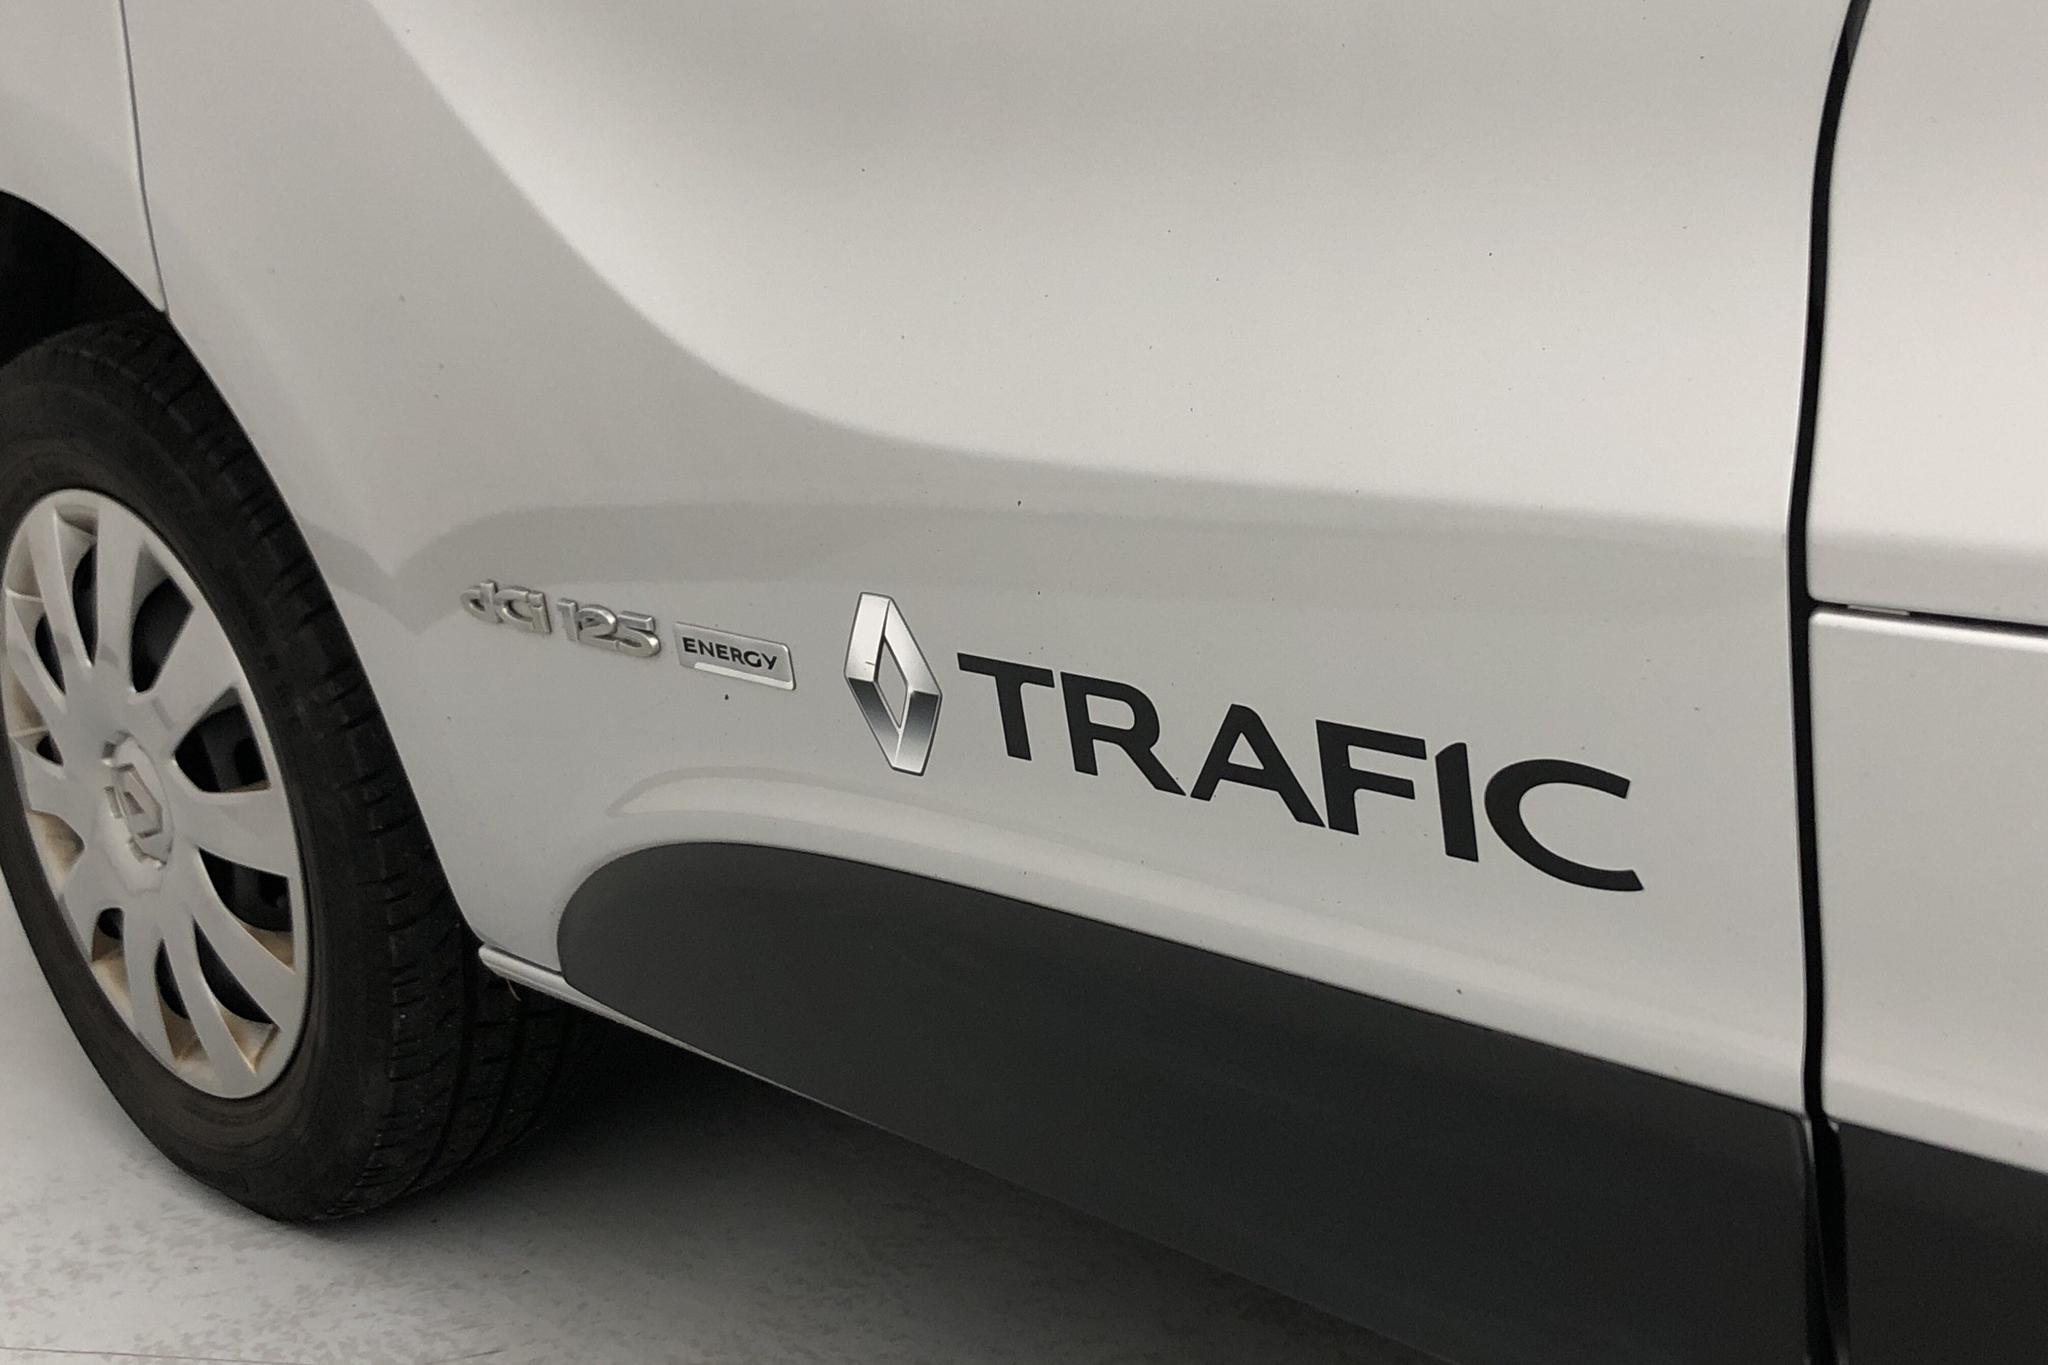 Renault Trafic 1.6 dCi Skåp (125hk) - 66 850 km - Manual - silver - 2017